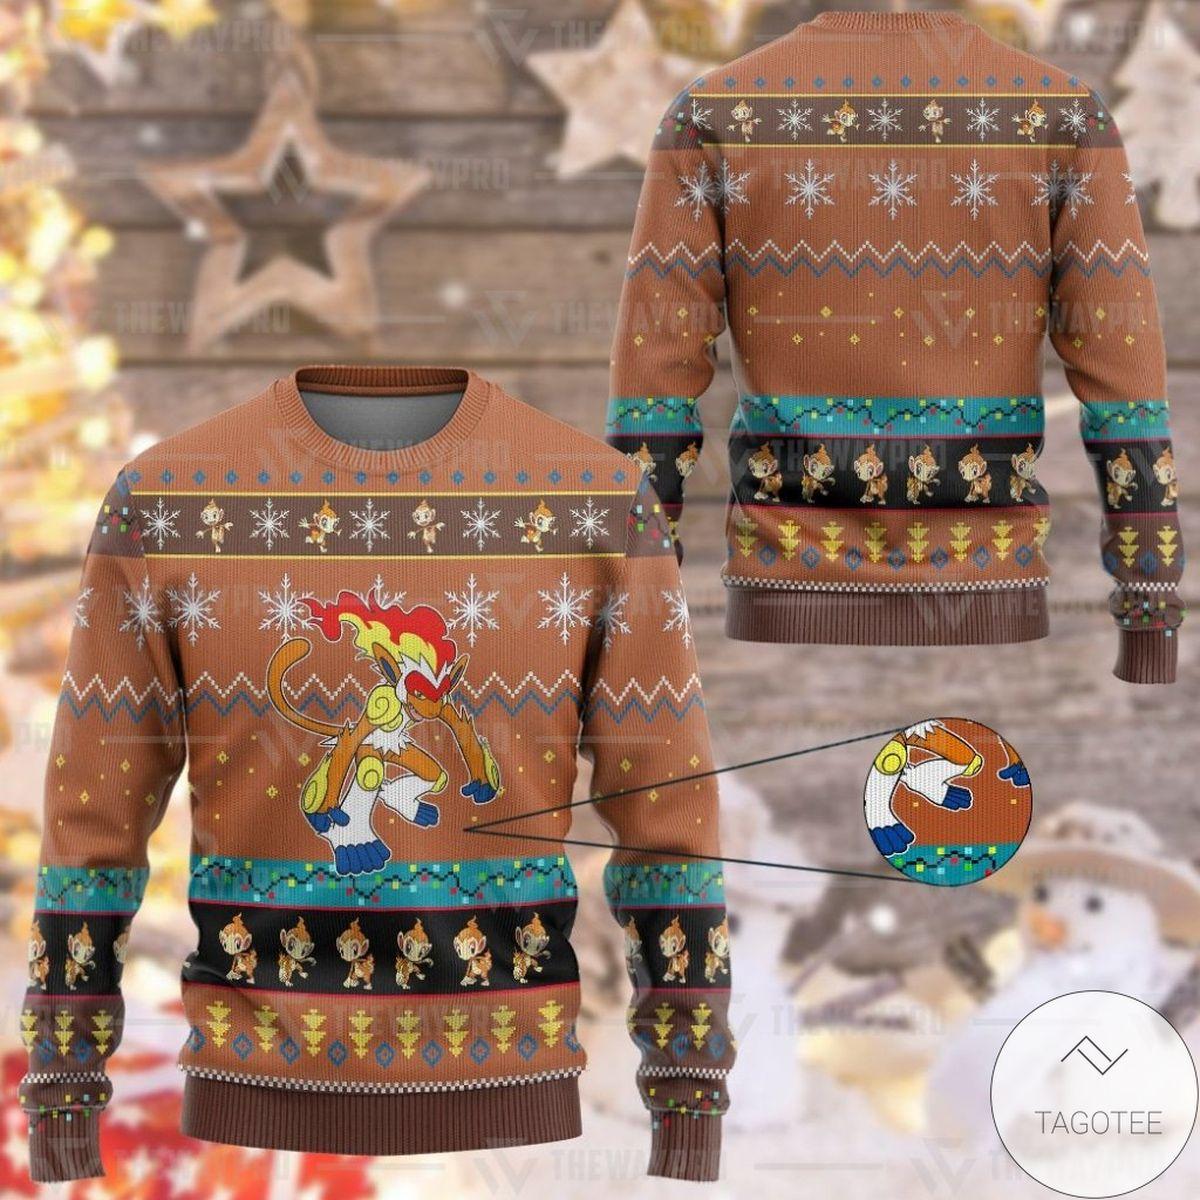 Anime Pokemon Infernape Custom Imitation Knitted Thicken Sweatshirt